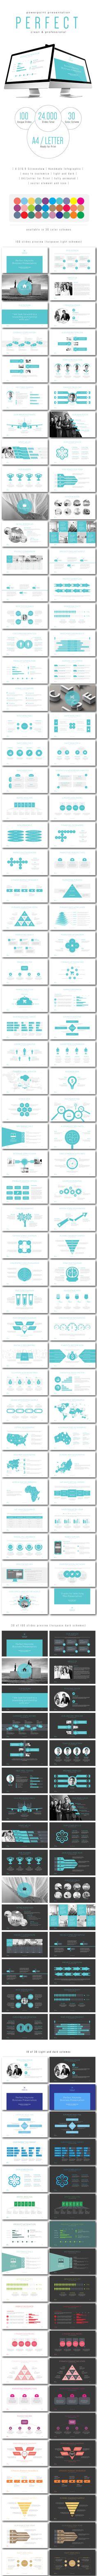 Multipurpose PowerPoint Presentation (Vol. 10) (Powerpoint Templates)